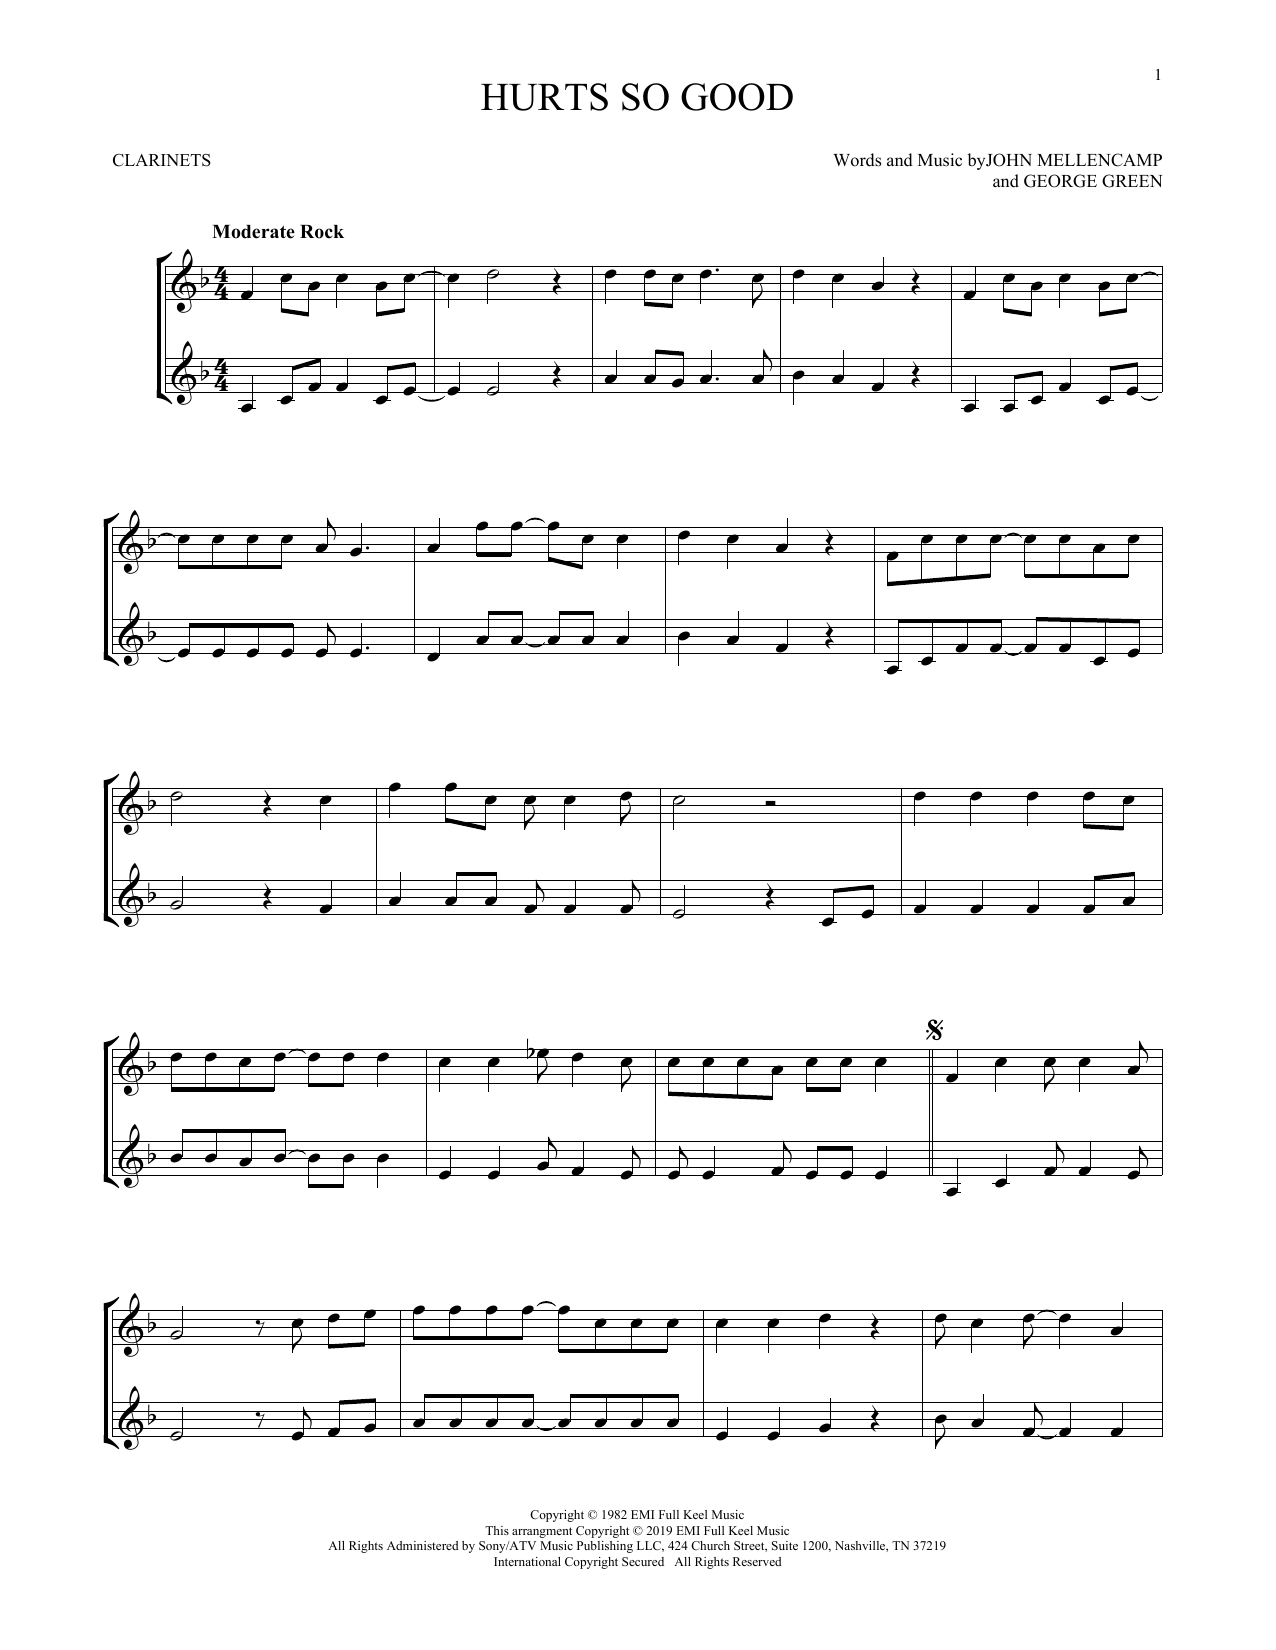 Hurts So Good (Clarinet Duet)